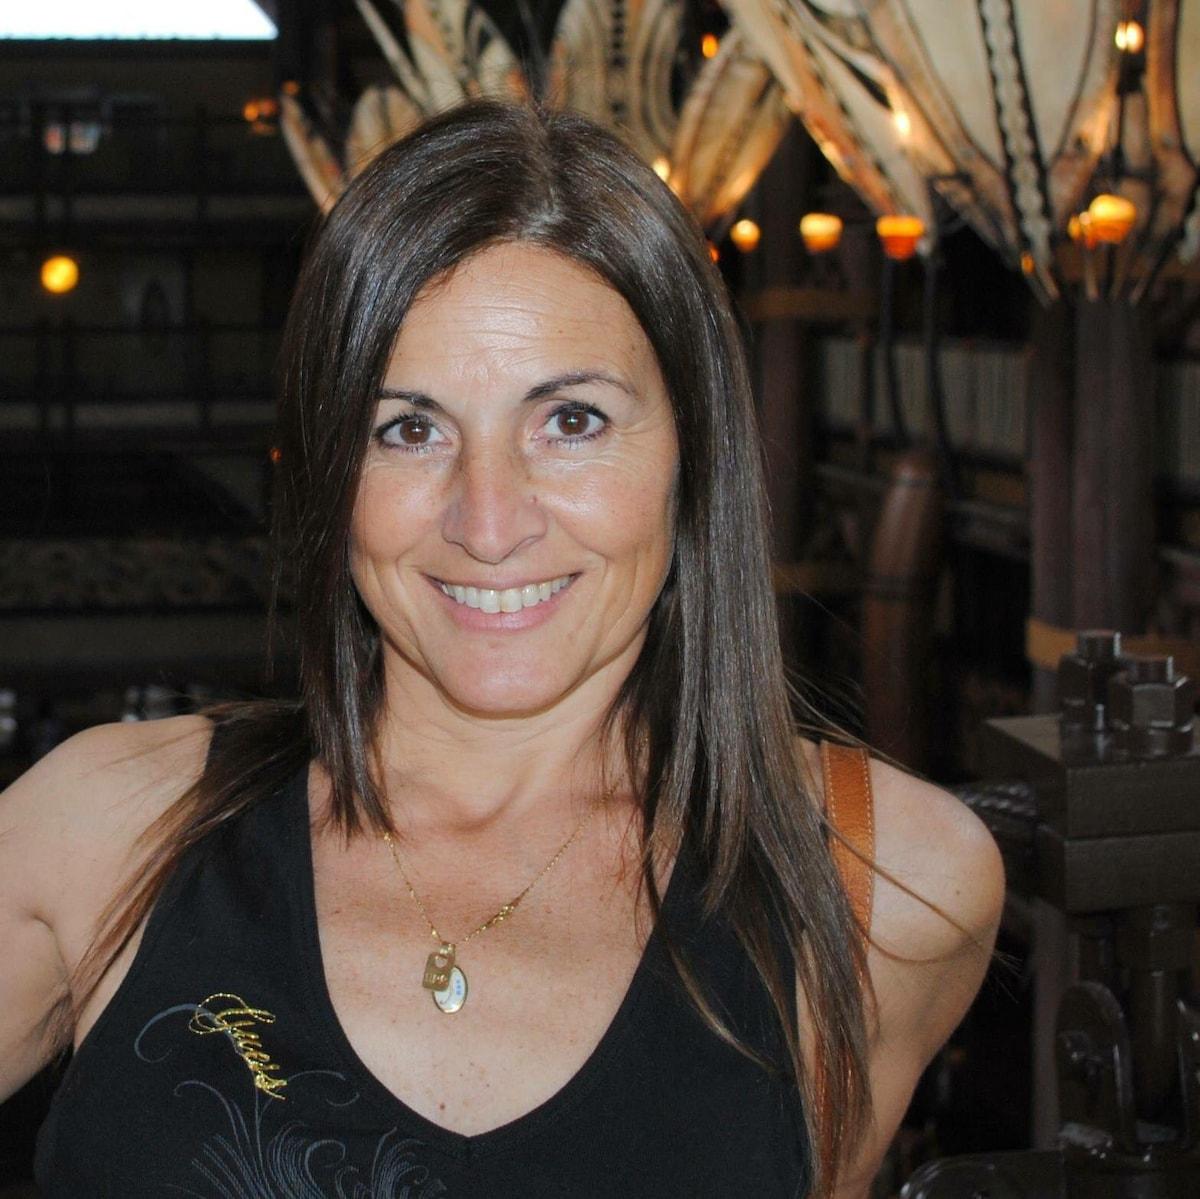 Sandra from Pinamar